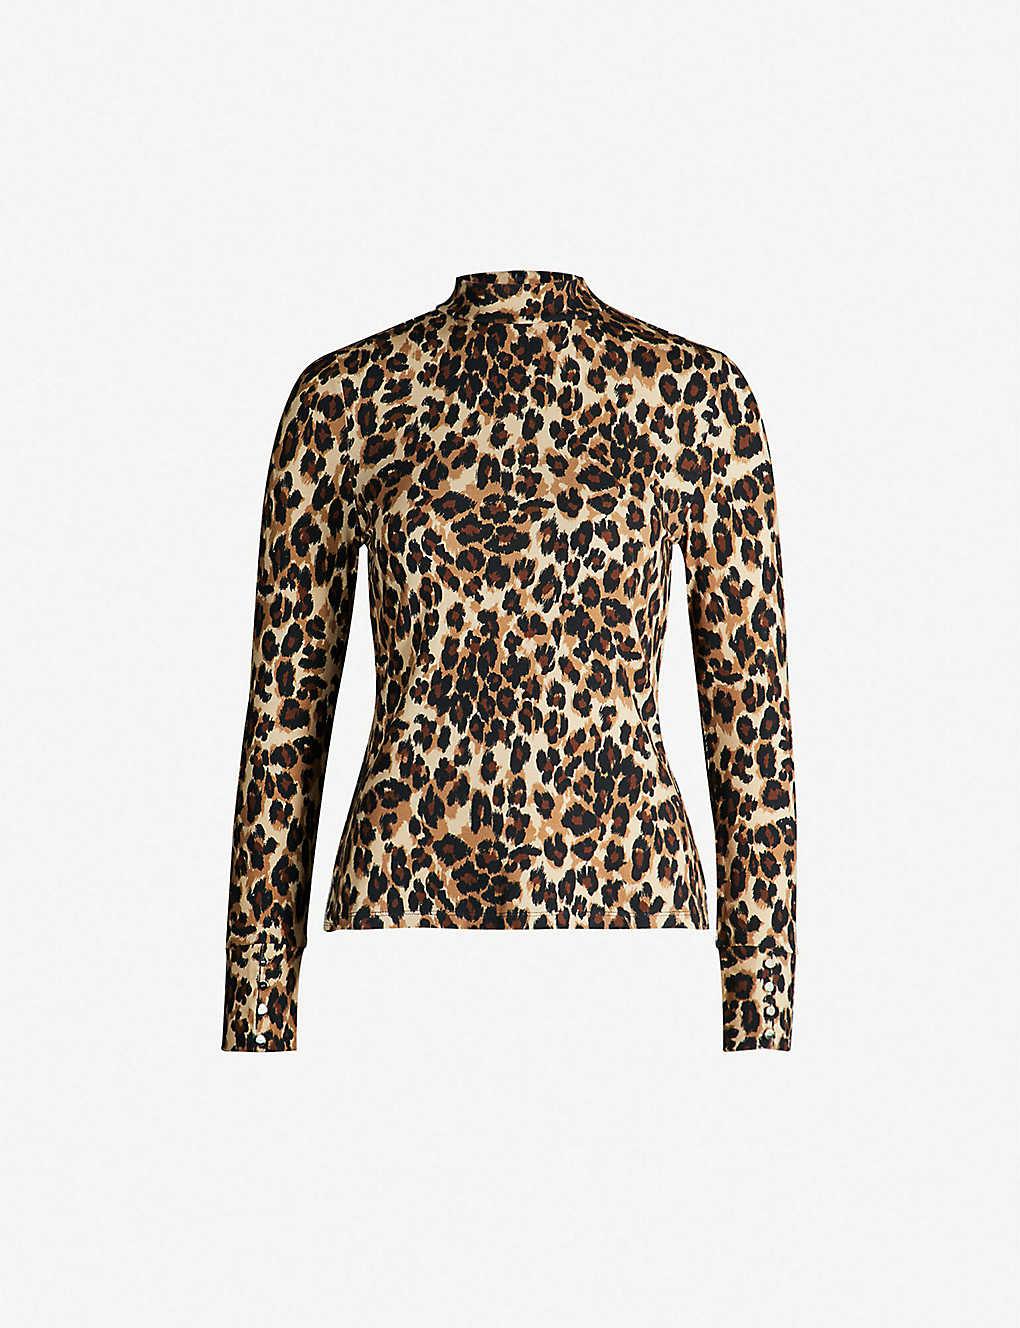 521ef995f4e KAREN MILLEN - Leopard-print funnel neck jersey top | Selfridges.com